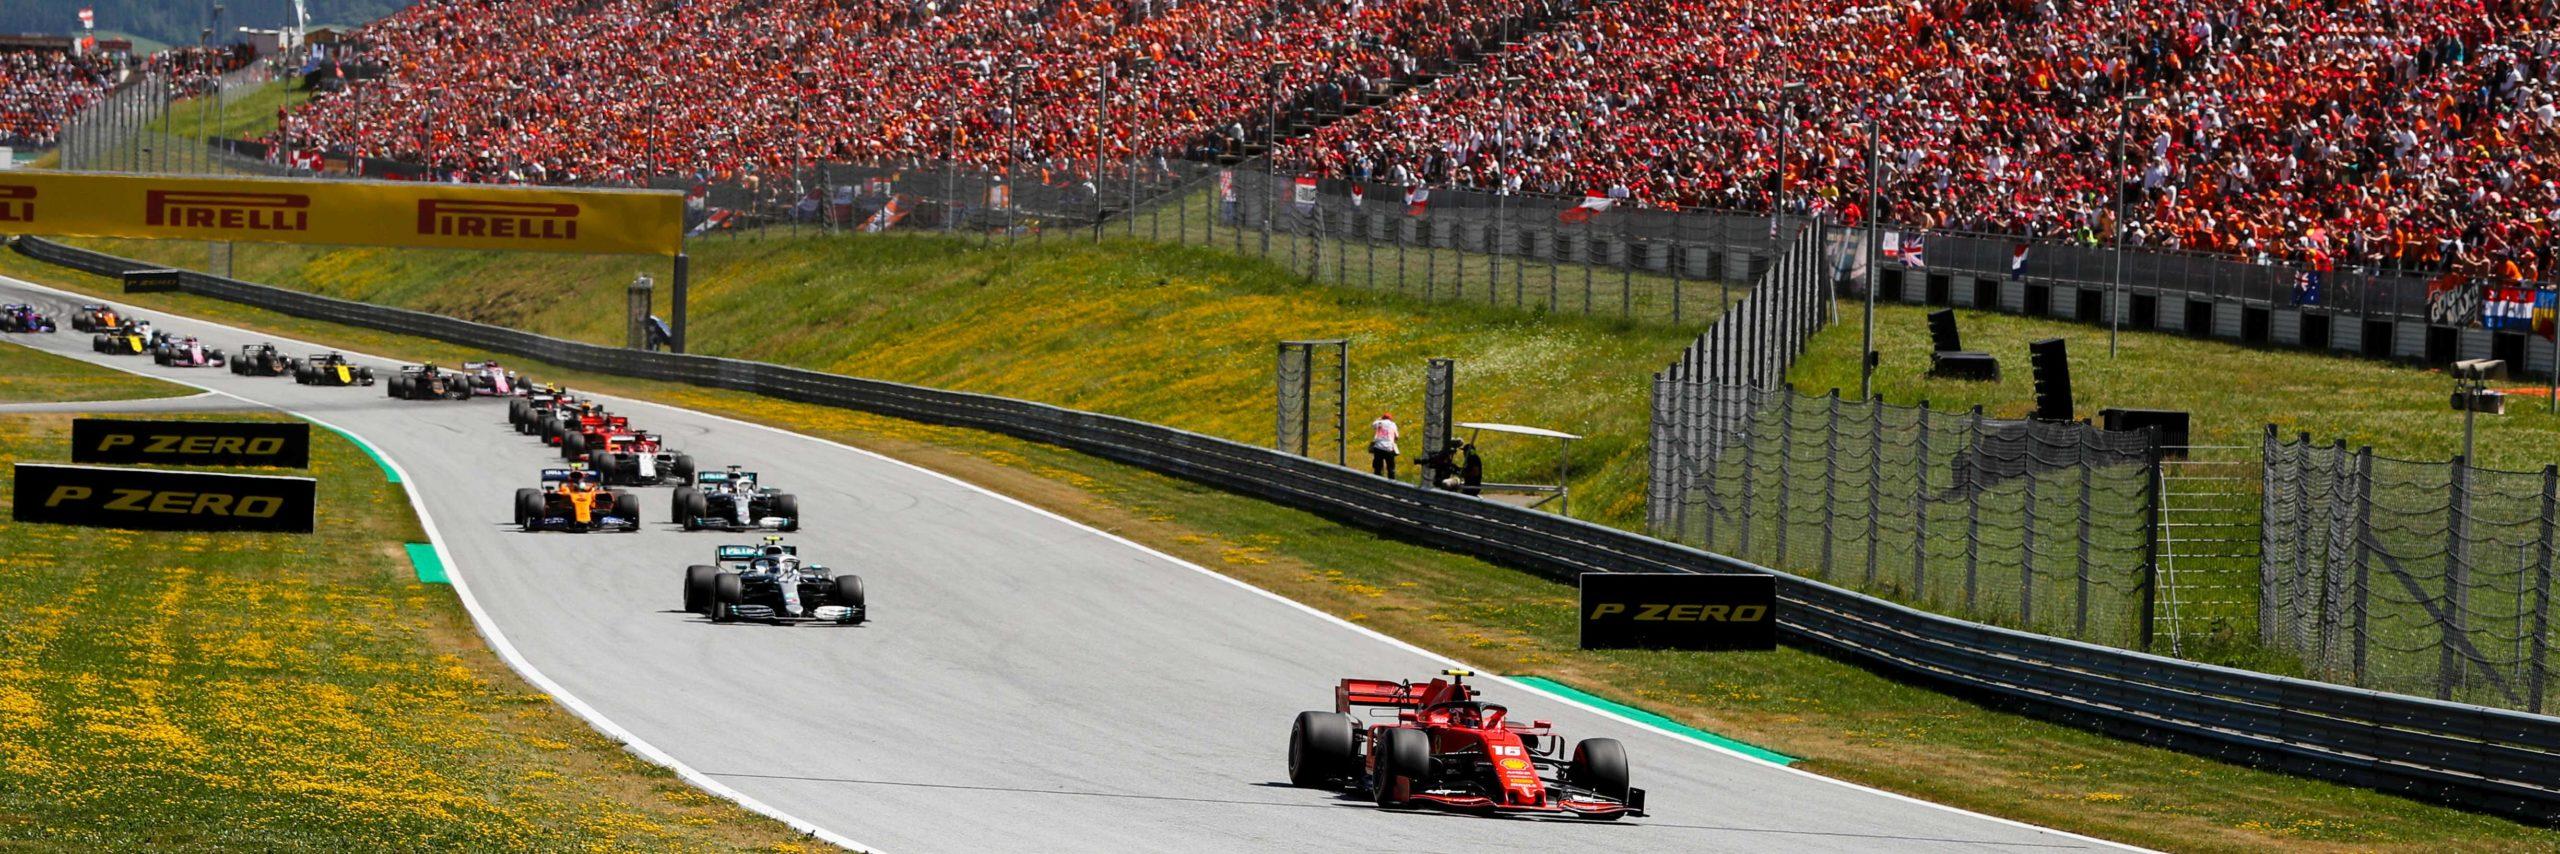 Formula 1 Austrian Grand Prix slide 1